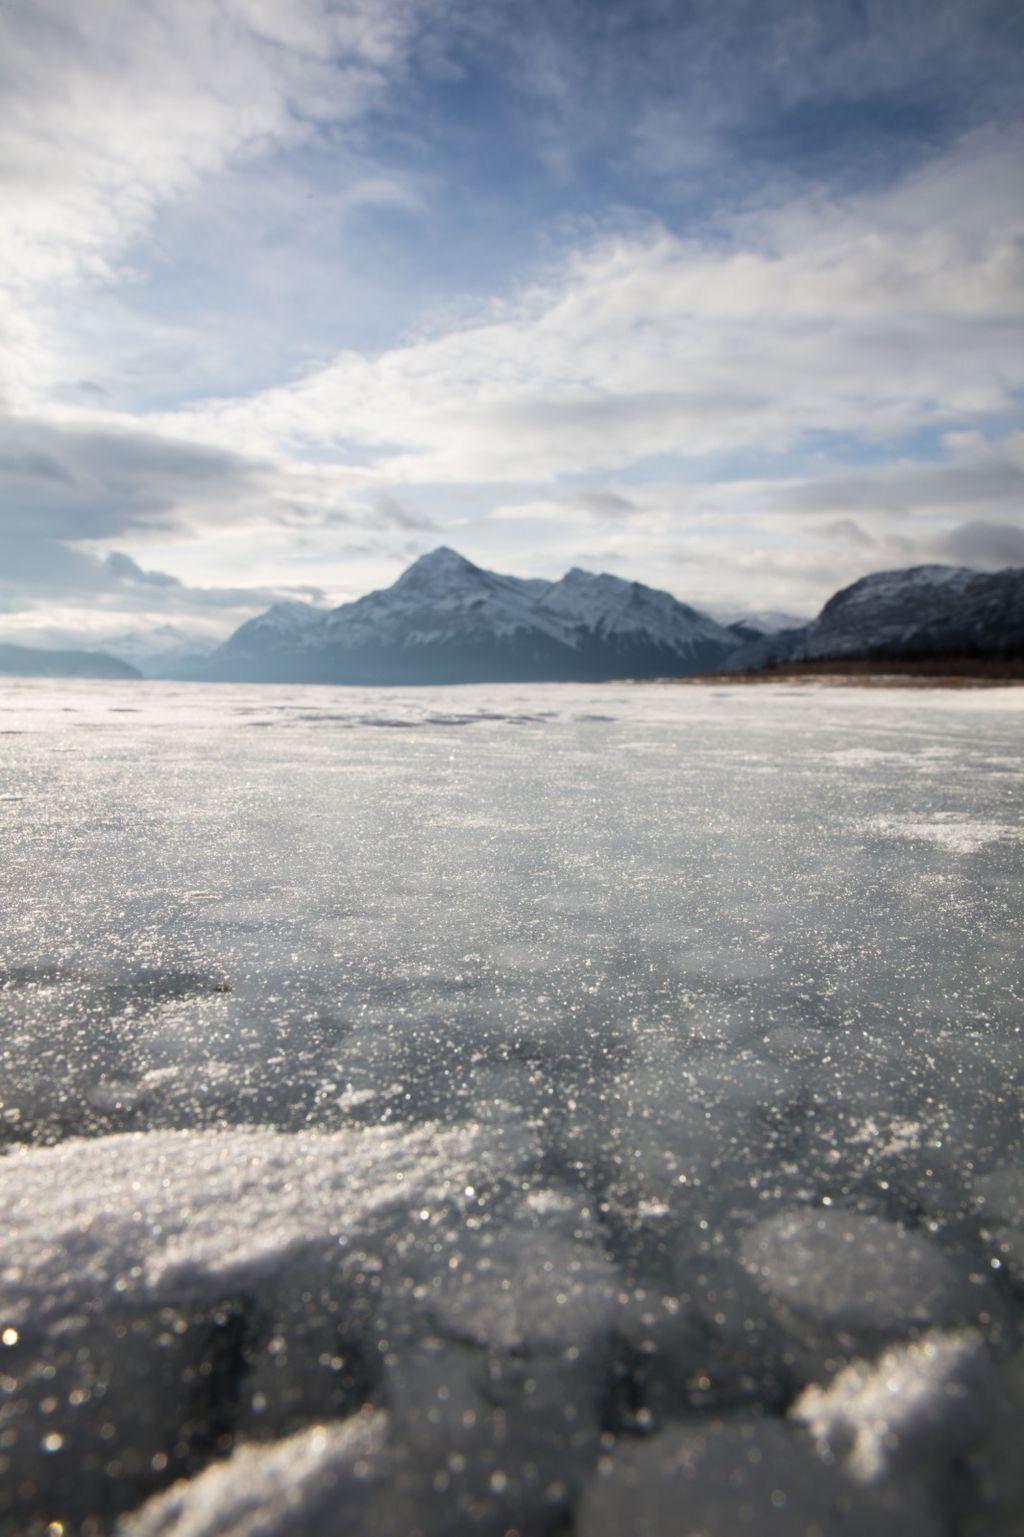 Canadian Rockies 005: lake abraham one